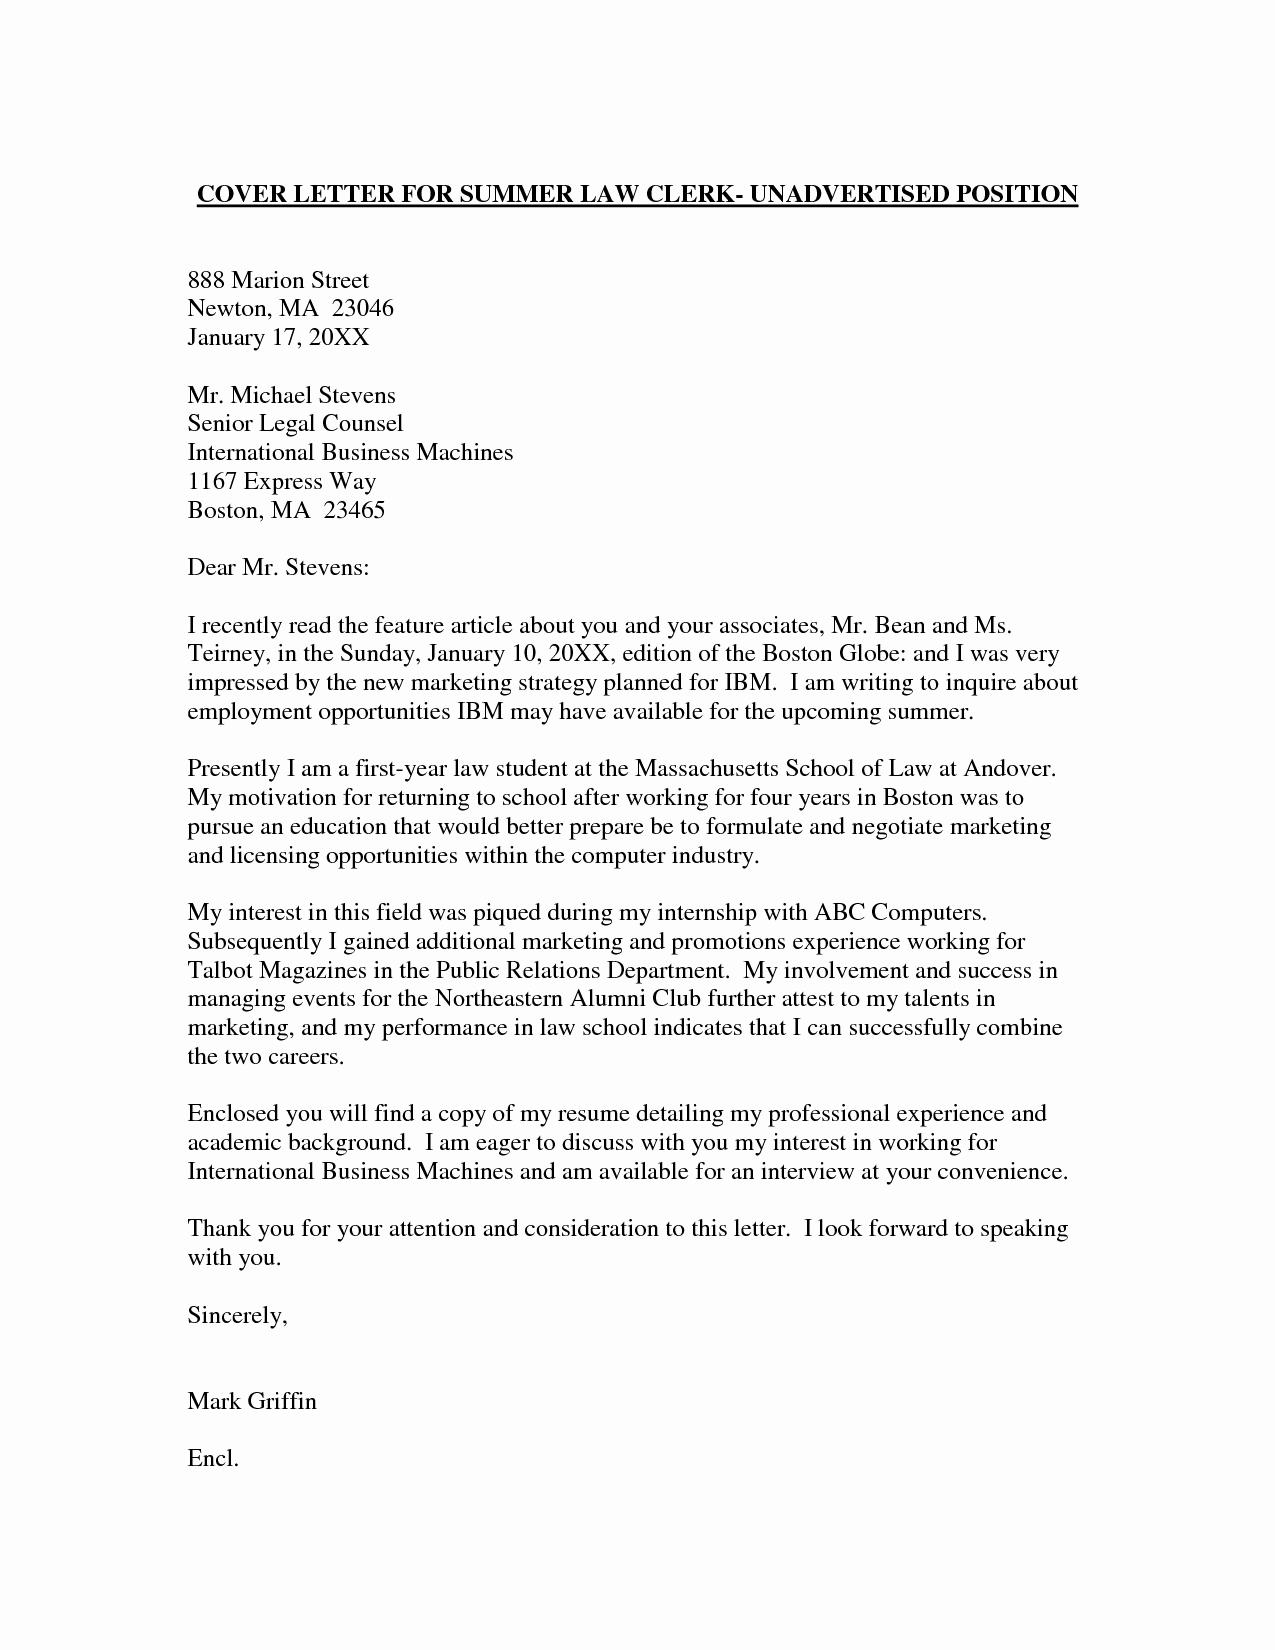 Best Cover Letter for Job Unique Employment Cover Letter Template Wondercover Letter